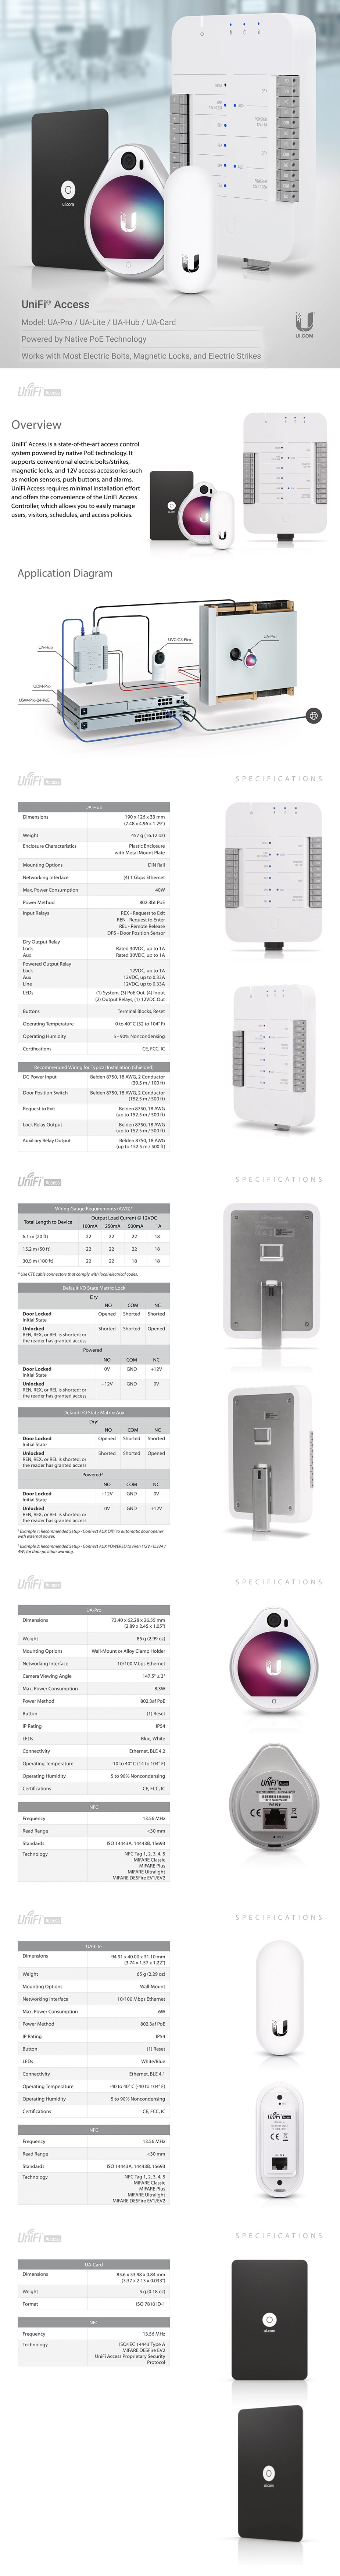 Ubiquiti Networks UniFi Access Starter Kit For UDM-PRO - Desktop Overview 1